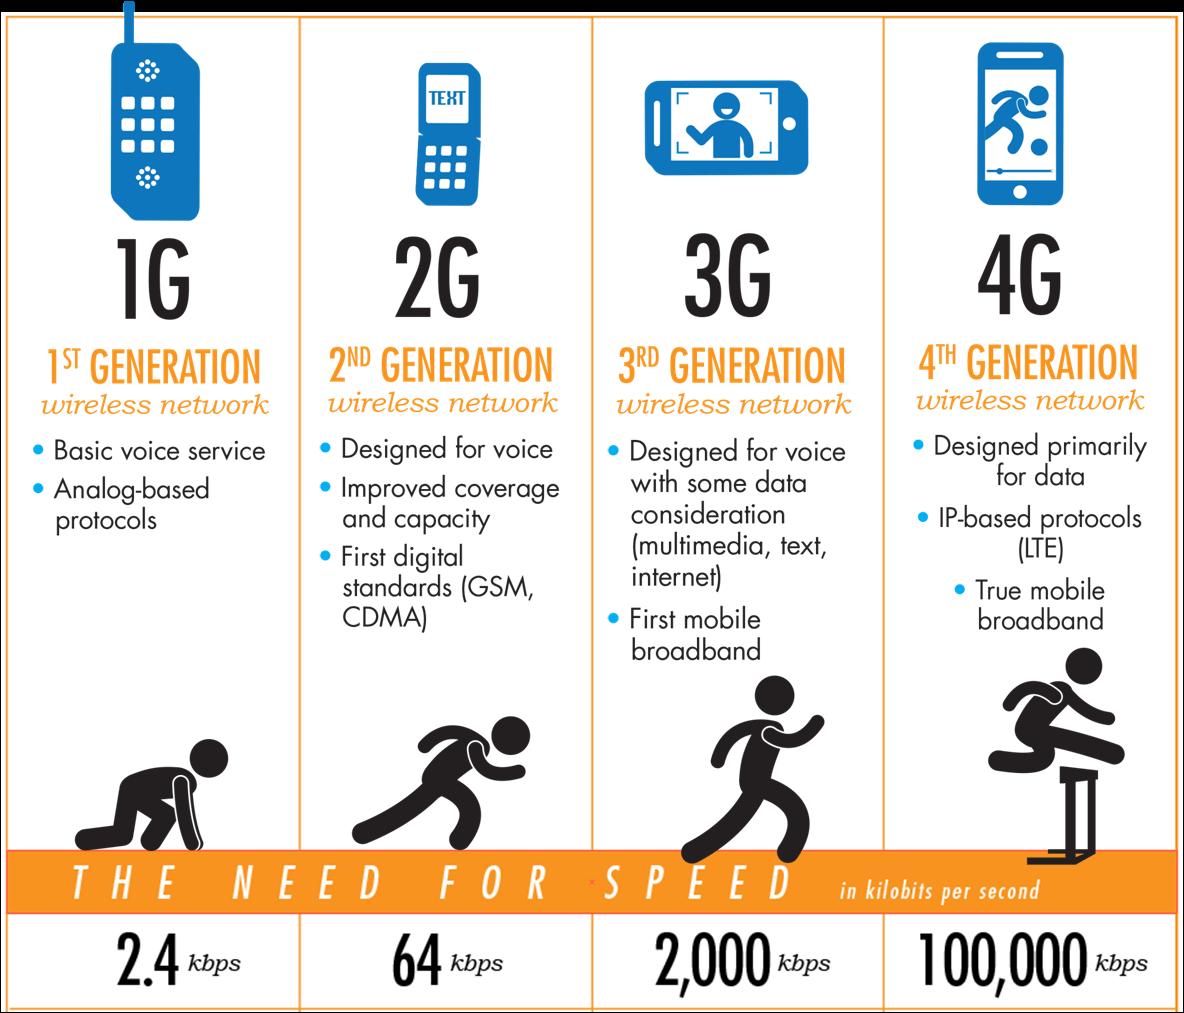 small resolution of mobile evolution 1g 2g 3g 4g